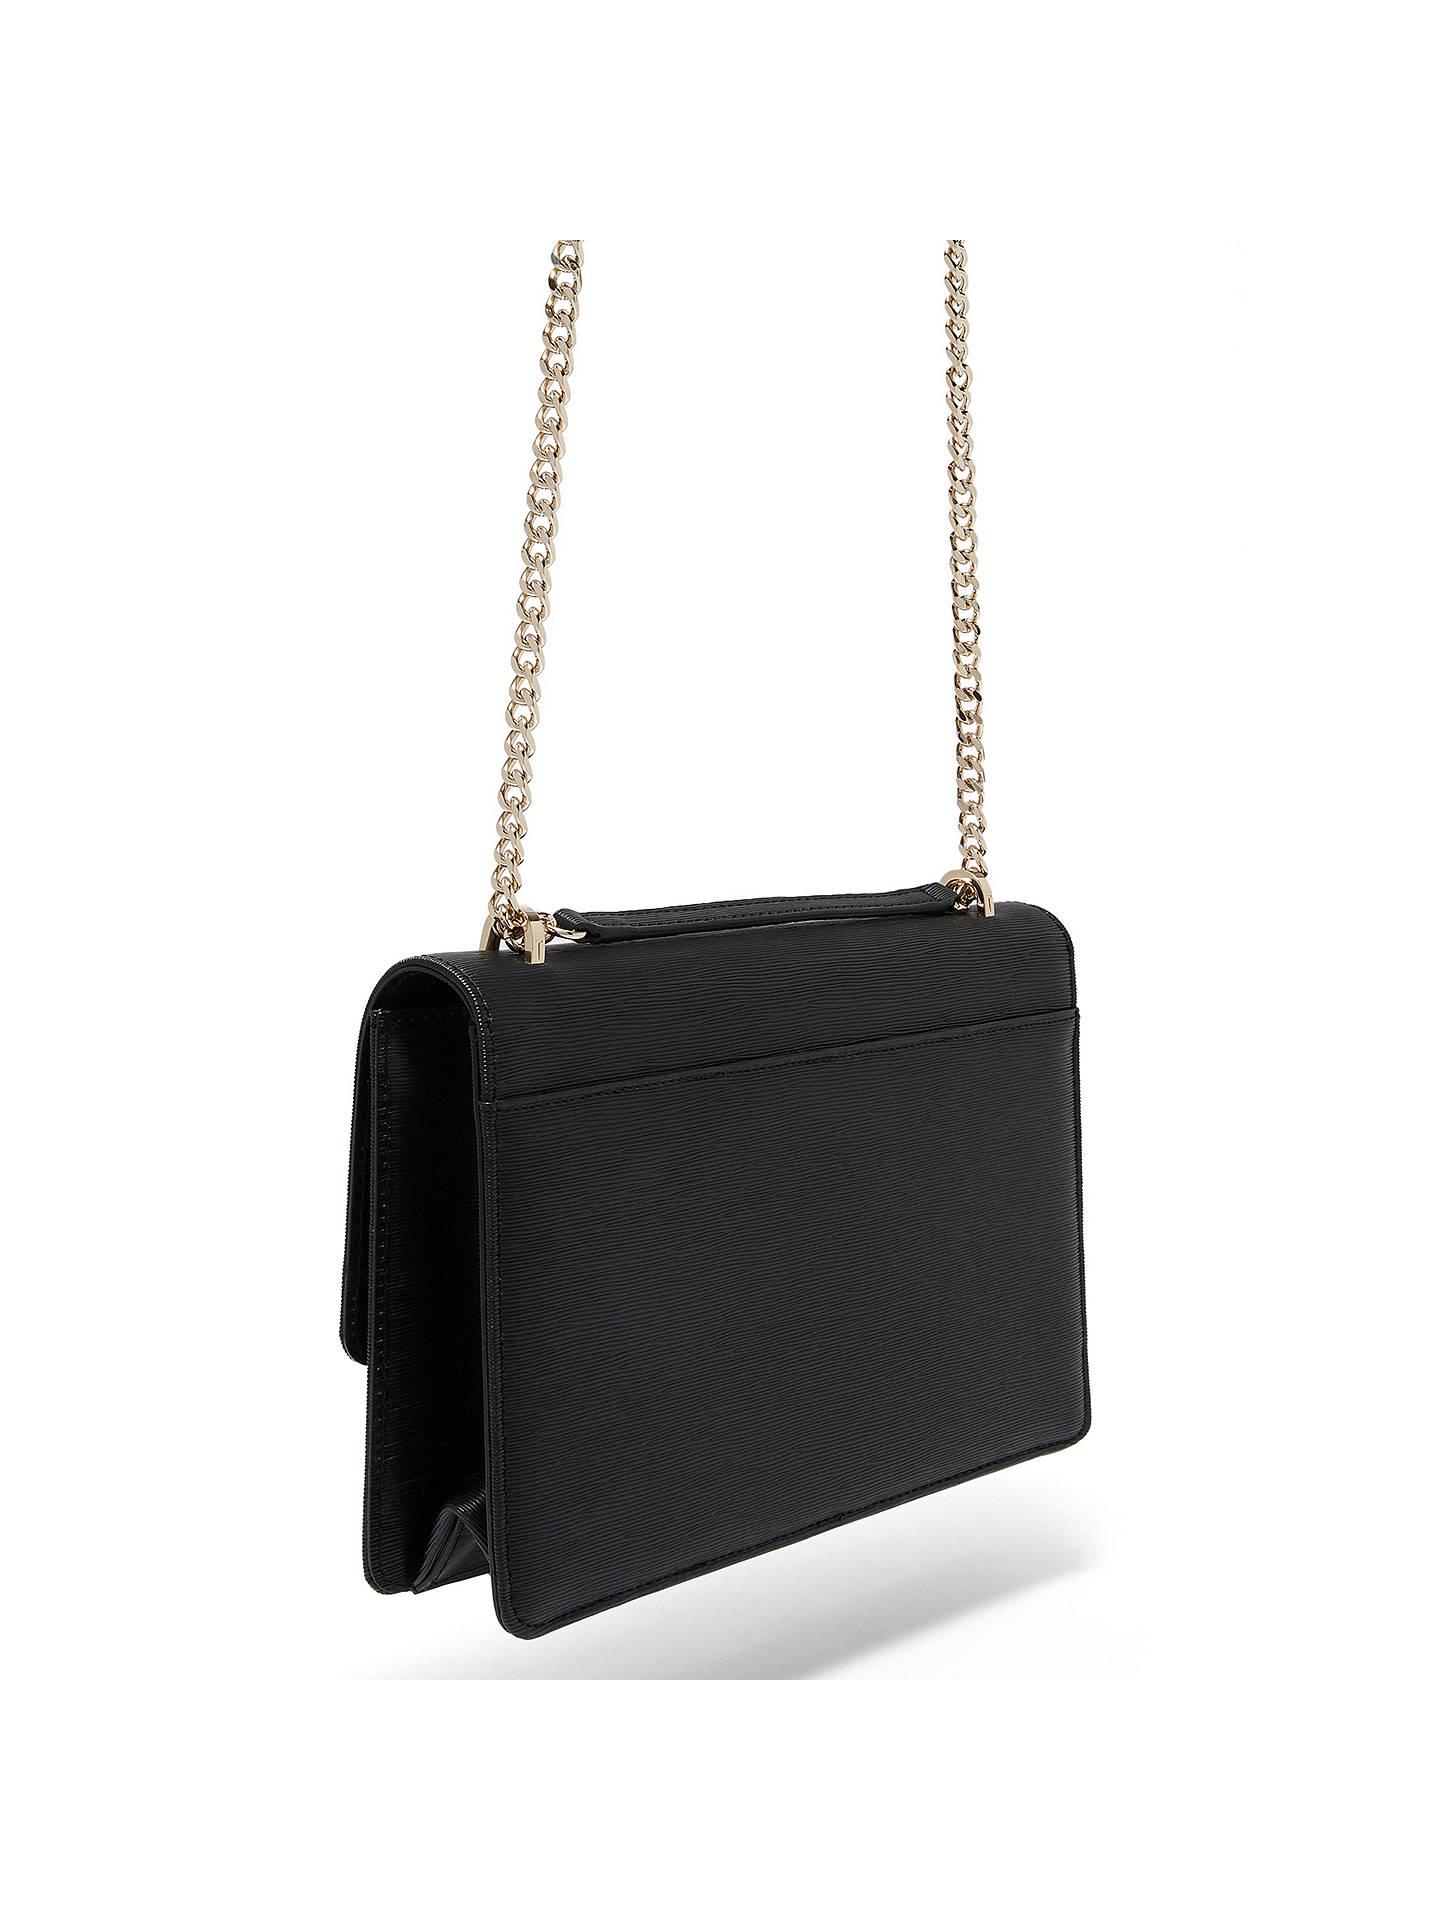 d089d0236f83 ... Buy Ted Baker Delila Bow Leather Cross Body Bag, Black Online at  johnlewis.com ...